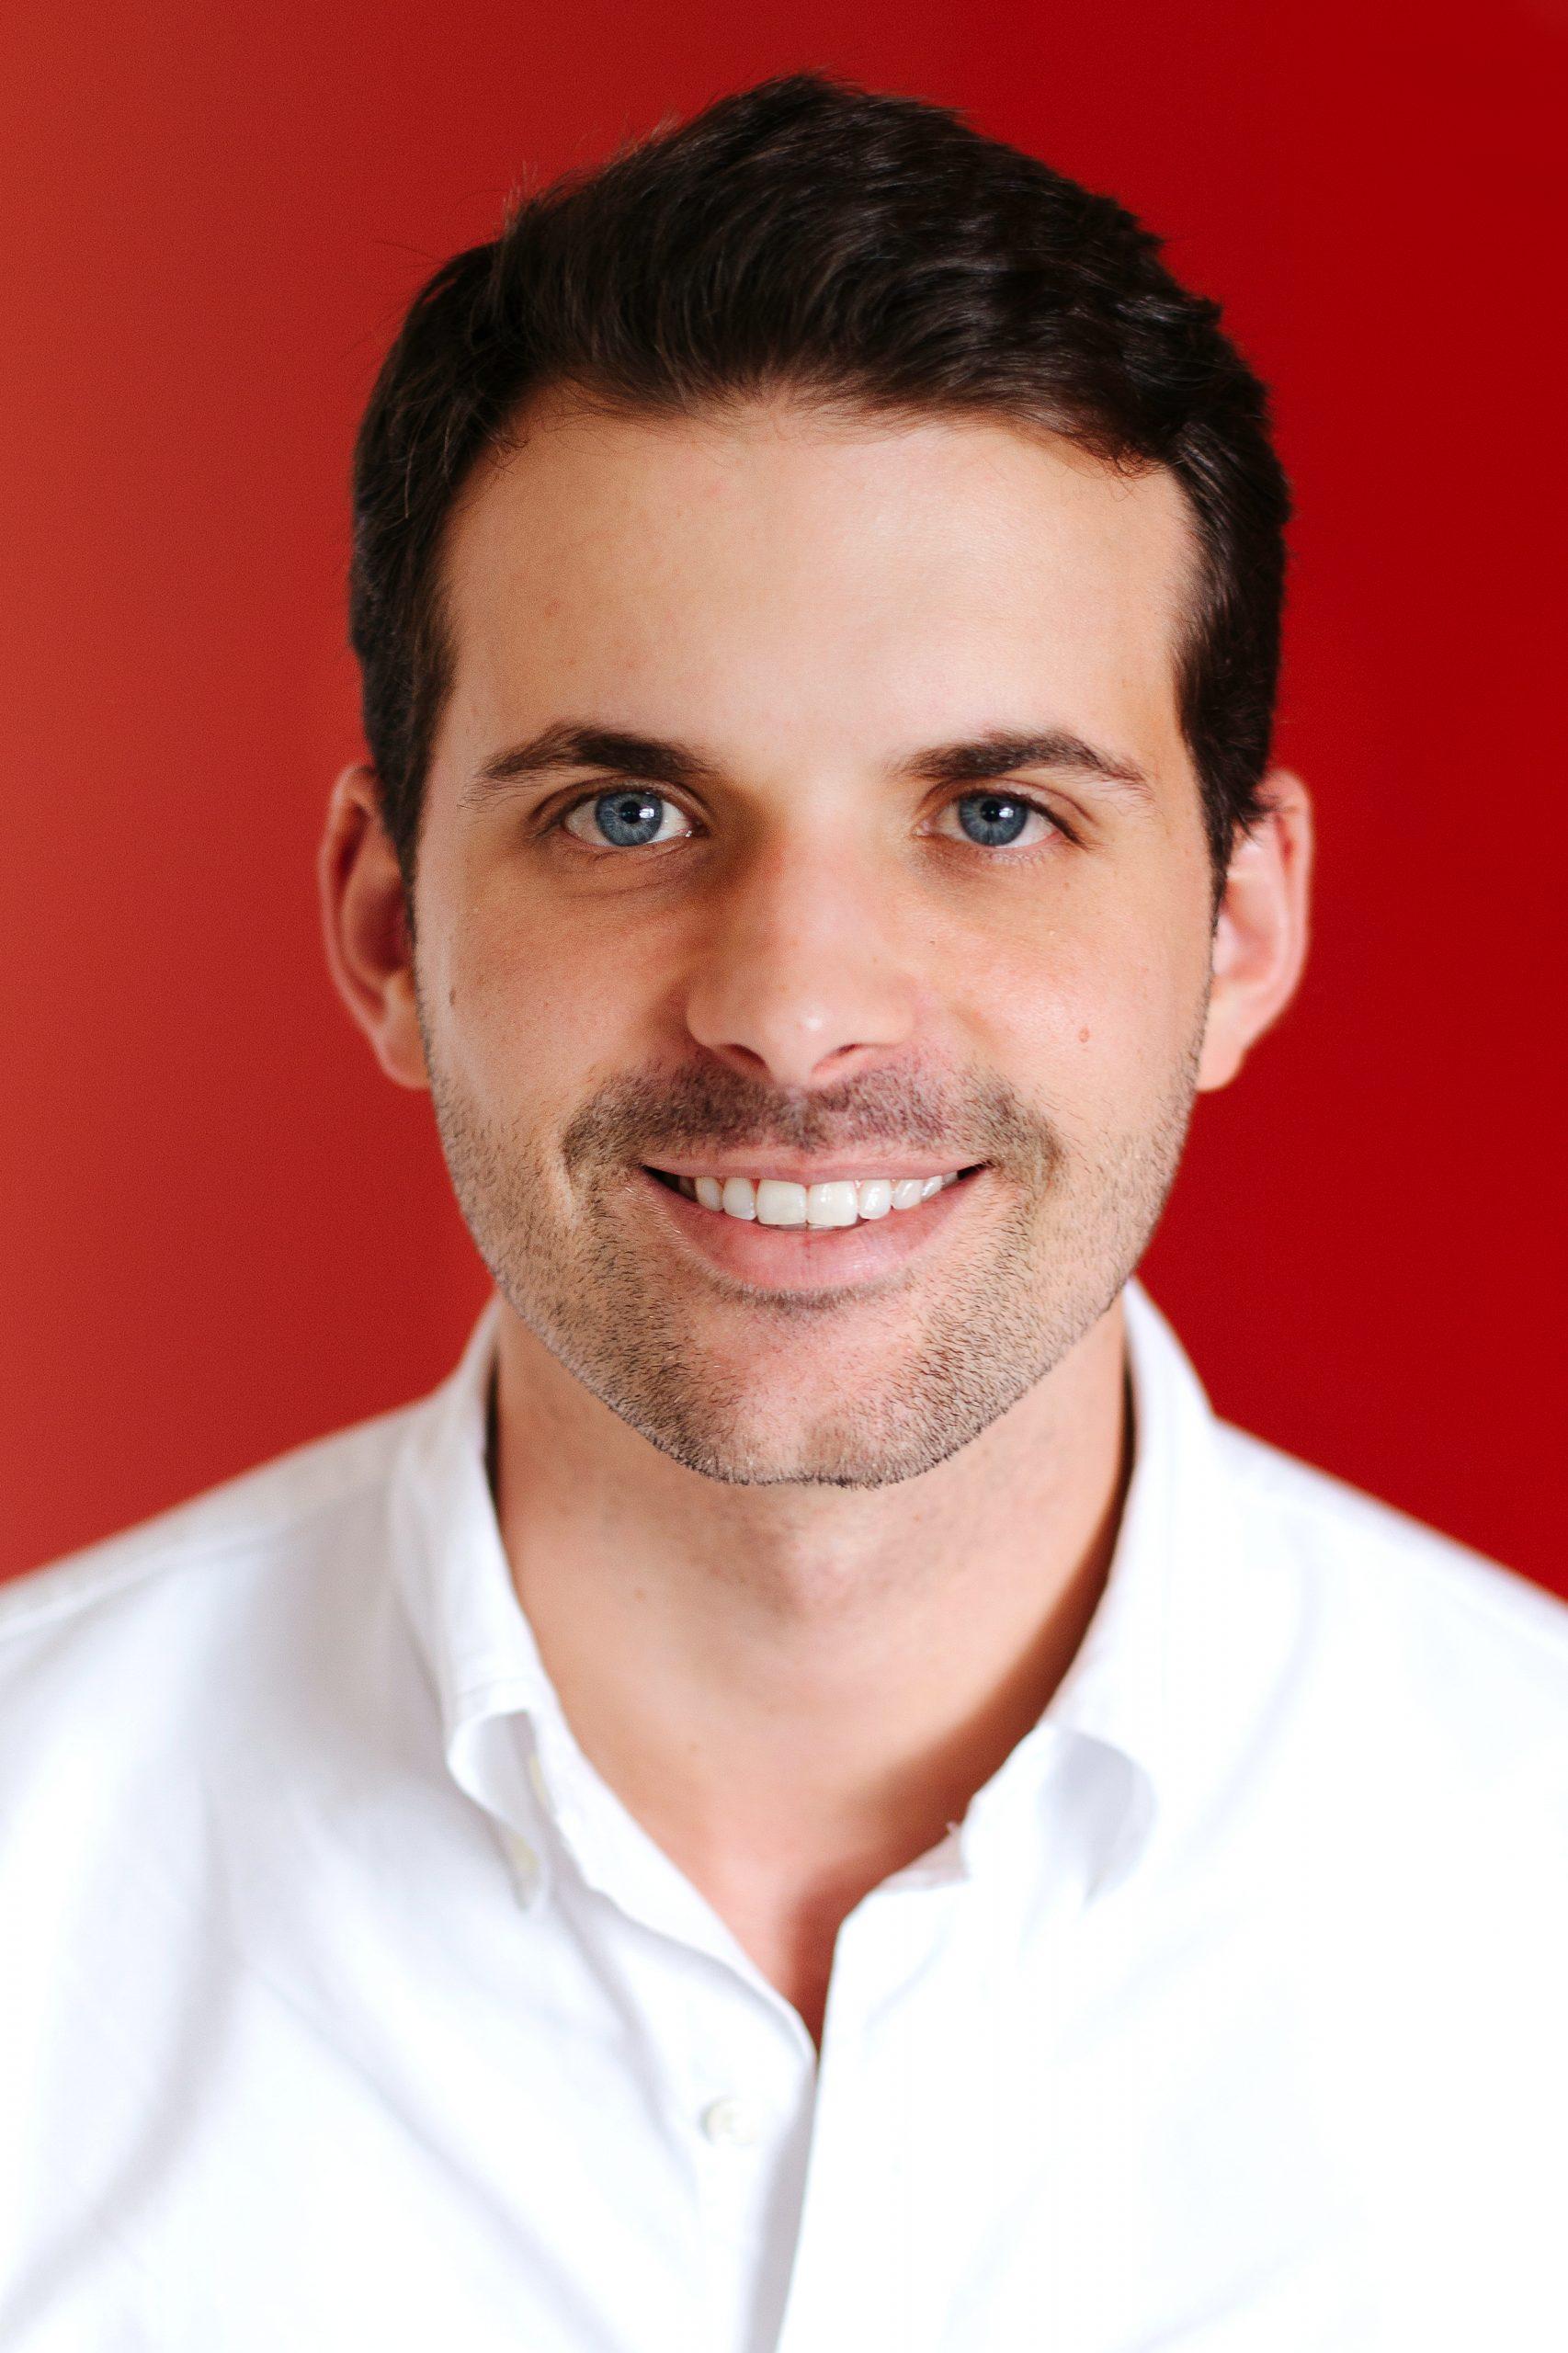 Lucas Pittioni